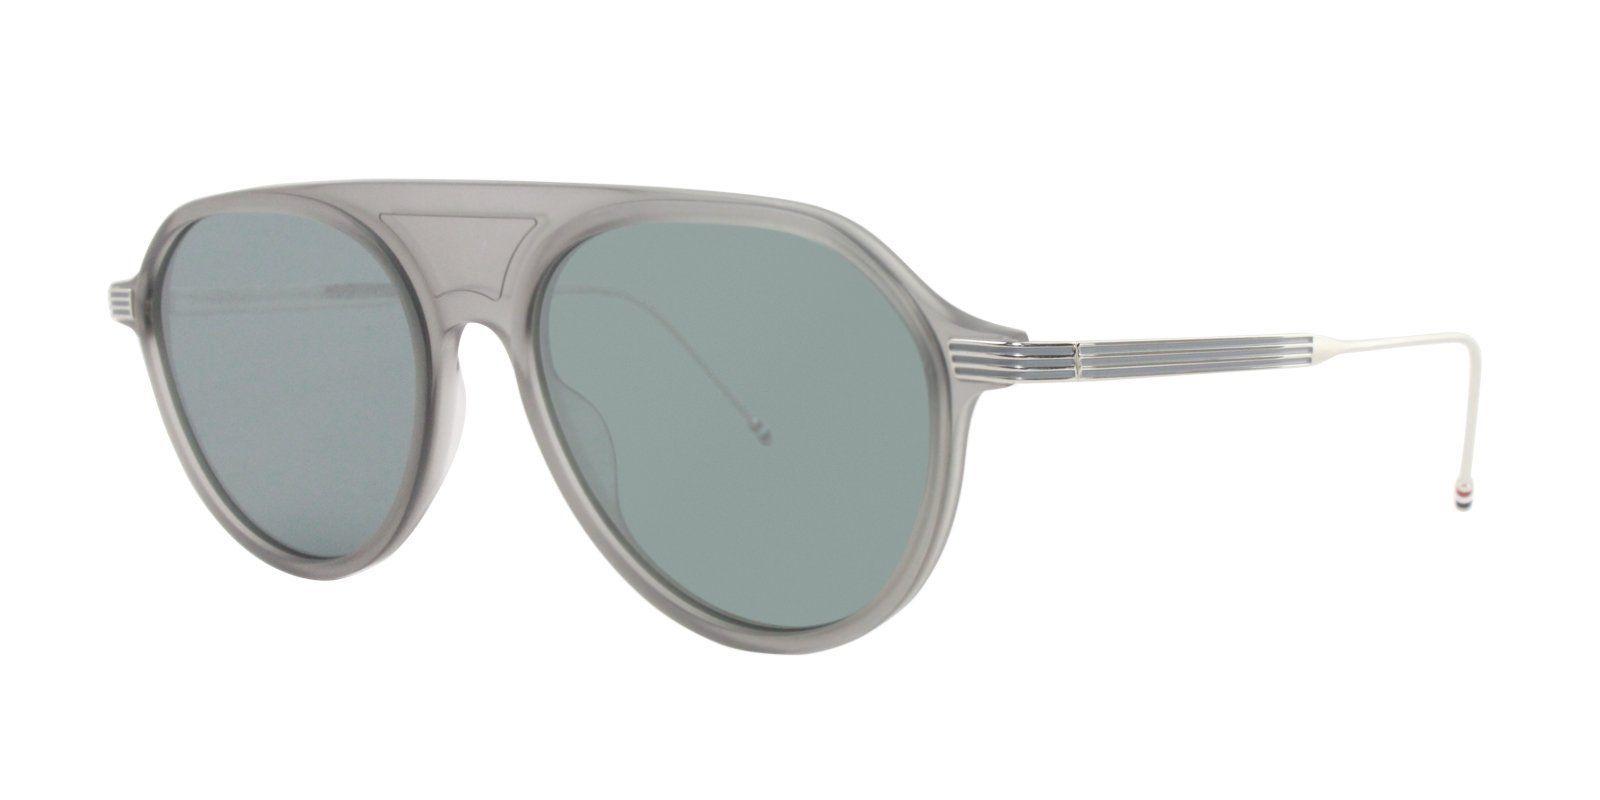 b365bf422be3 Thom Browne - TB-809 Gray - Gray-sunglasses-Designer Eyes